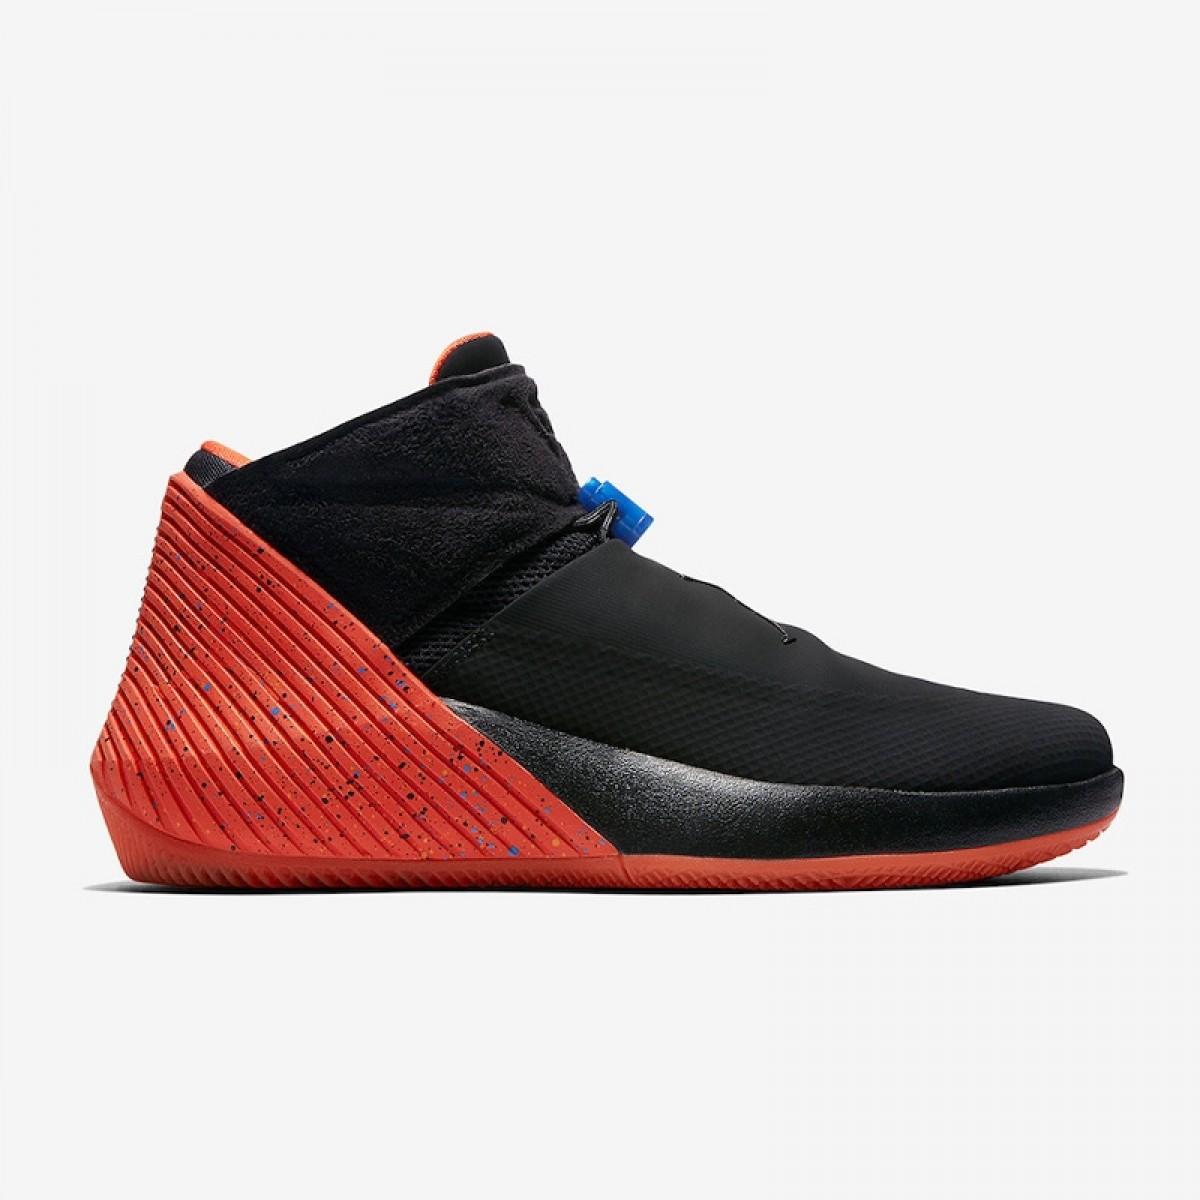 f8448609d1c Buy Jordan Why Not Zer0.1 'Triple Double' Basketball shoes & sneakers